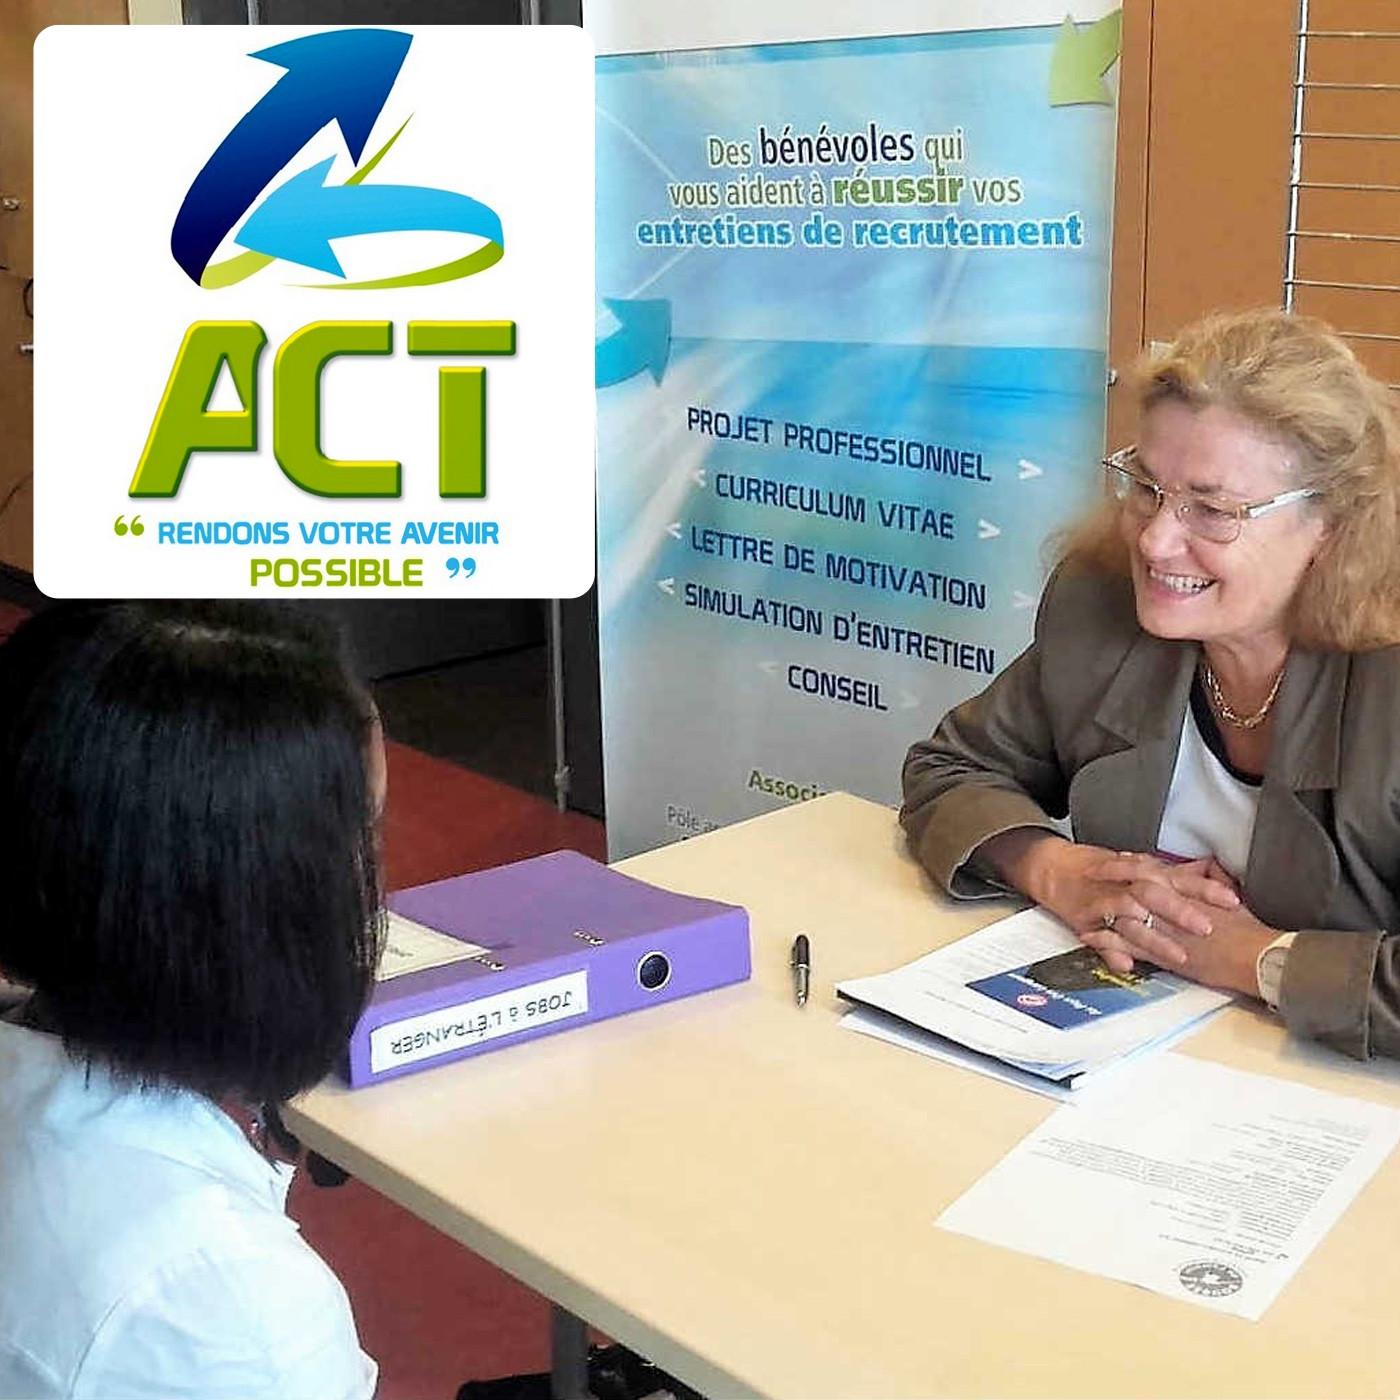 Carte postale radio [2021] : ACT Gironde (Accompagner - Conduire - Transmettre)